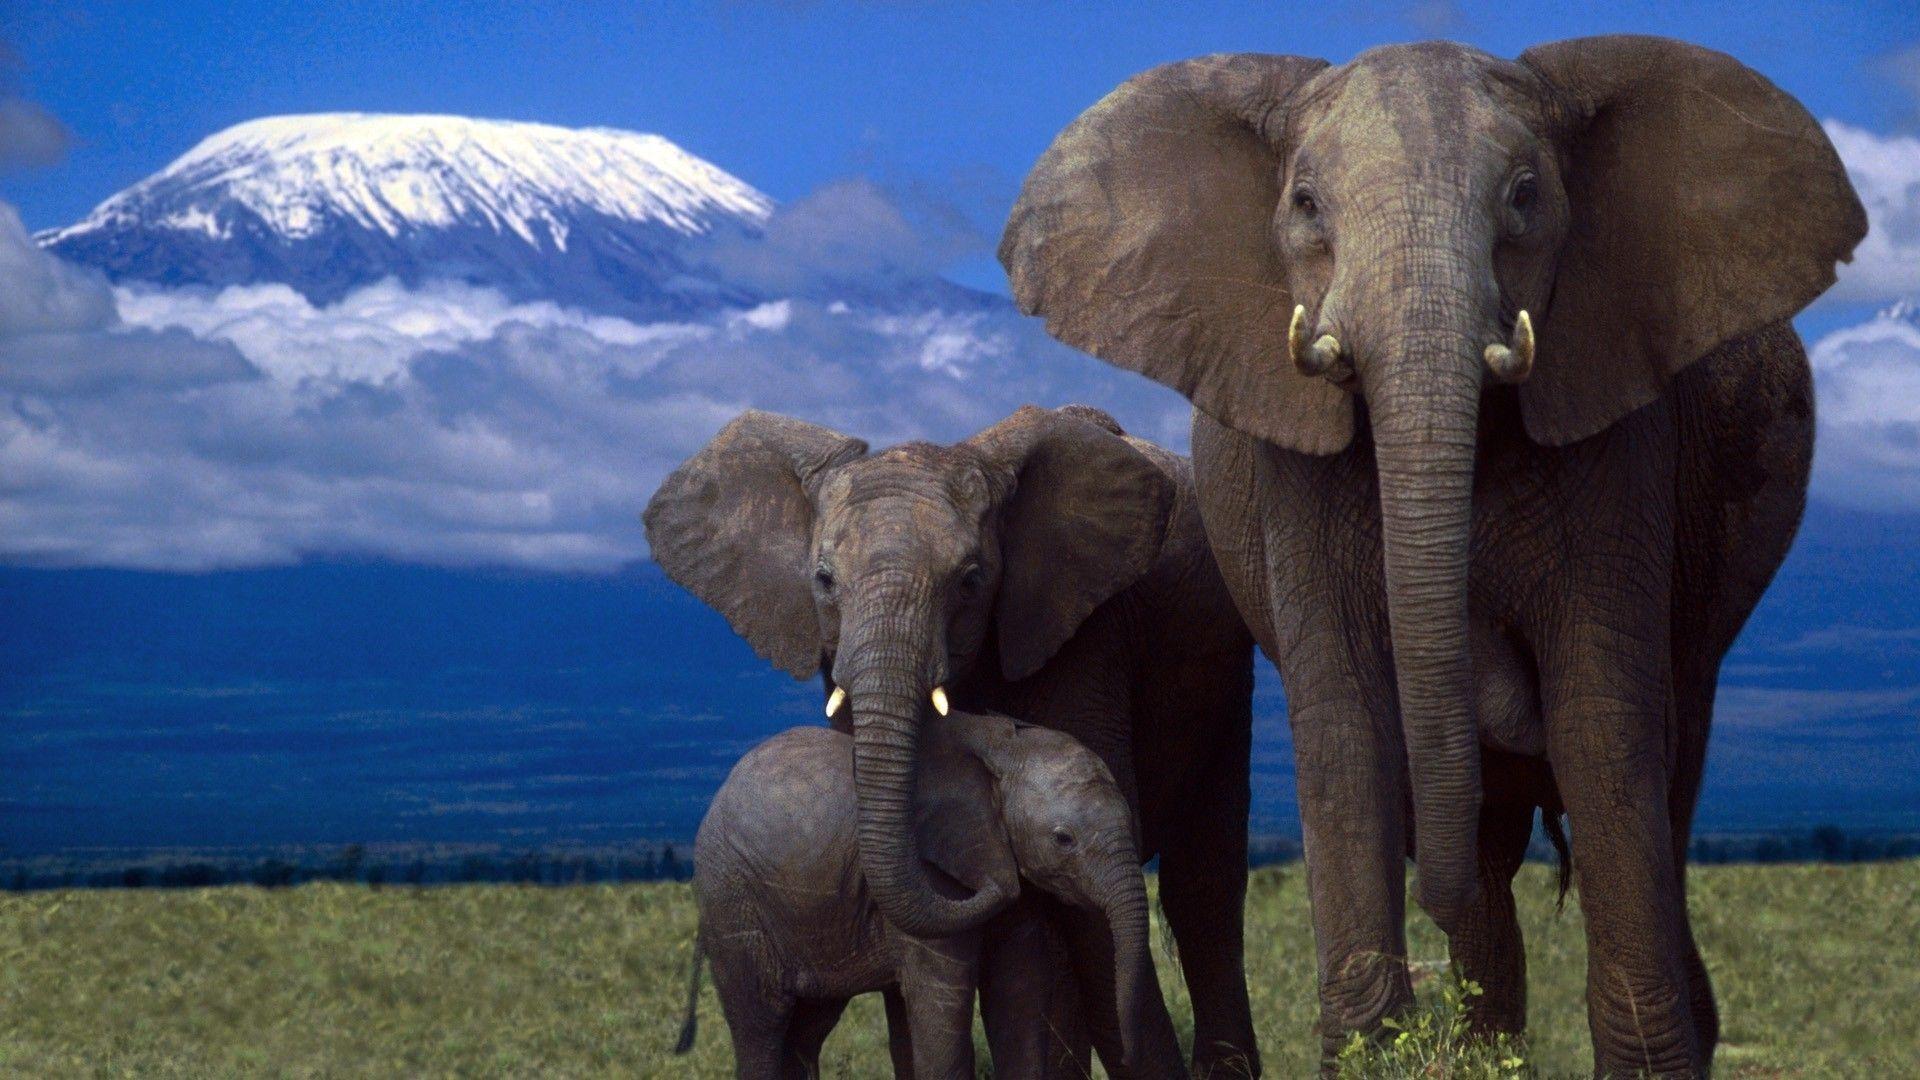 Fantastic Wallpaper High Quality Elephant - 27aa7eef6d482b4105132d35633b2d56  Snapshot_613690.jpg